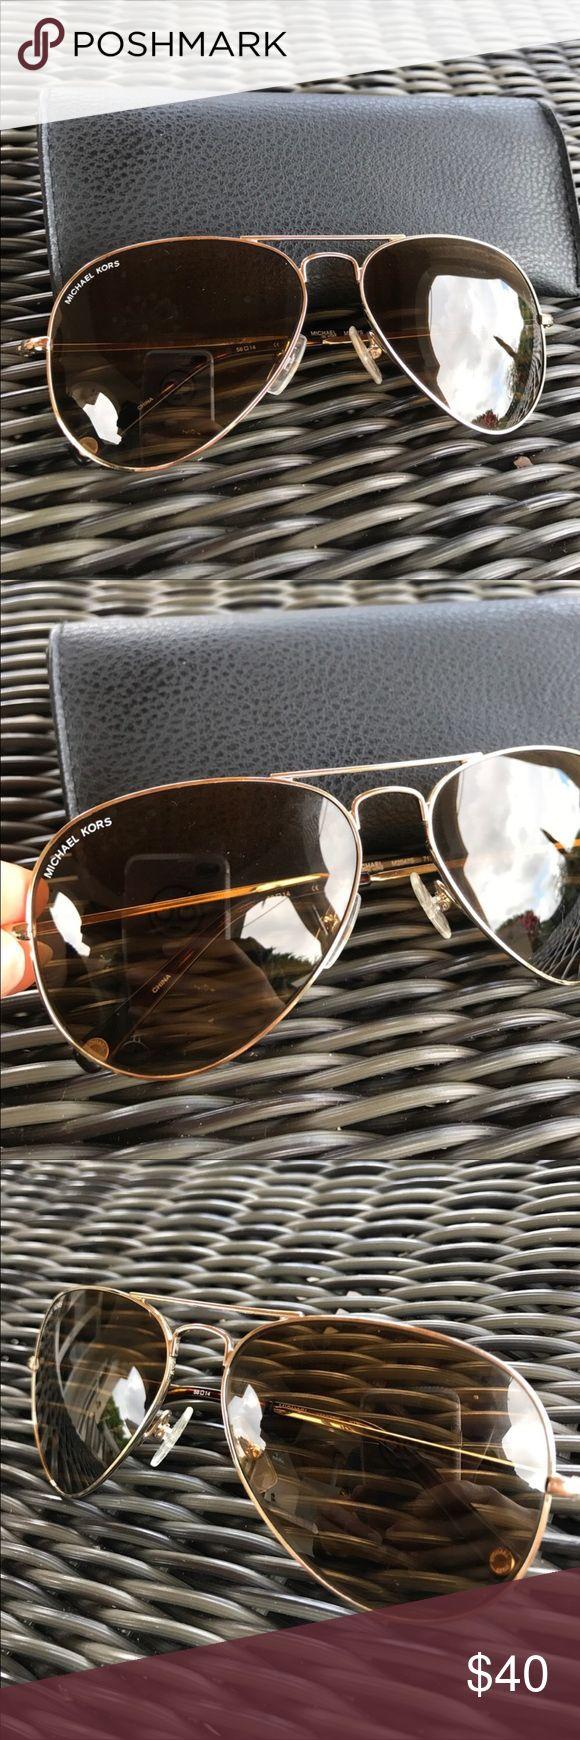 Michael Kors Sunglasses Michael Kors sunglasses - aviators Michael Kors Accessories Glasses